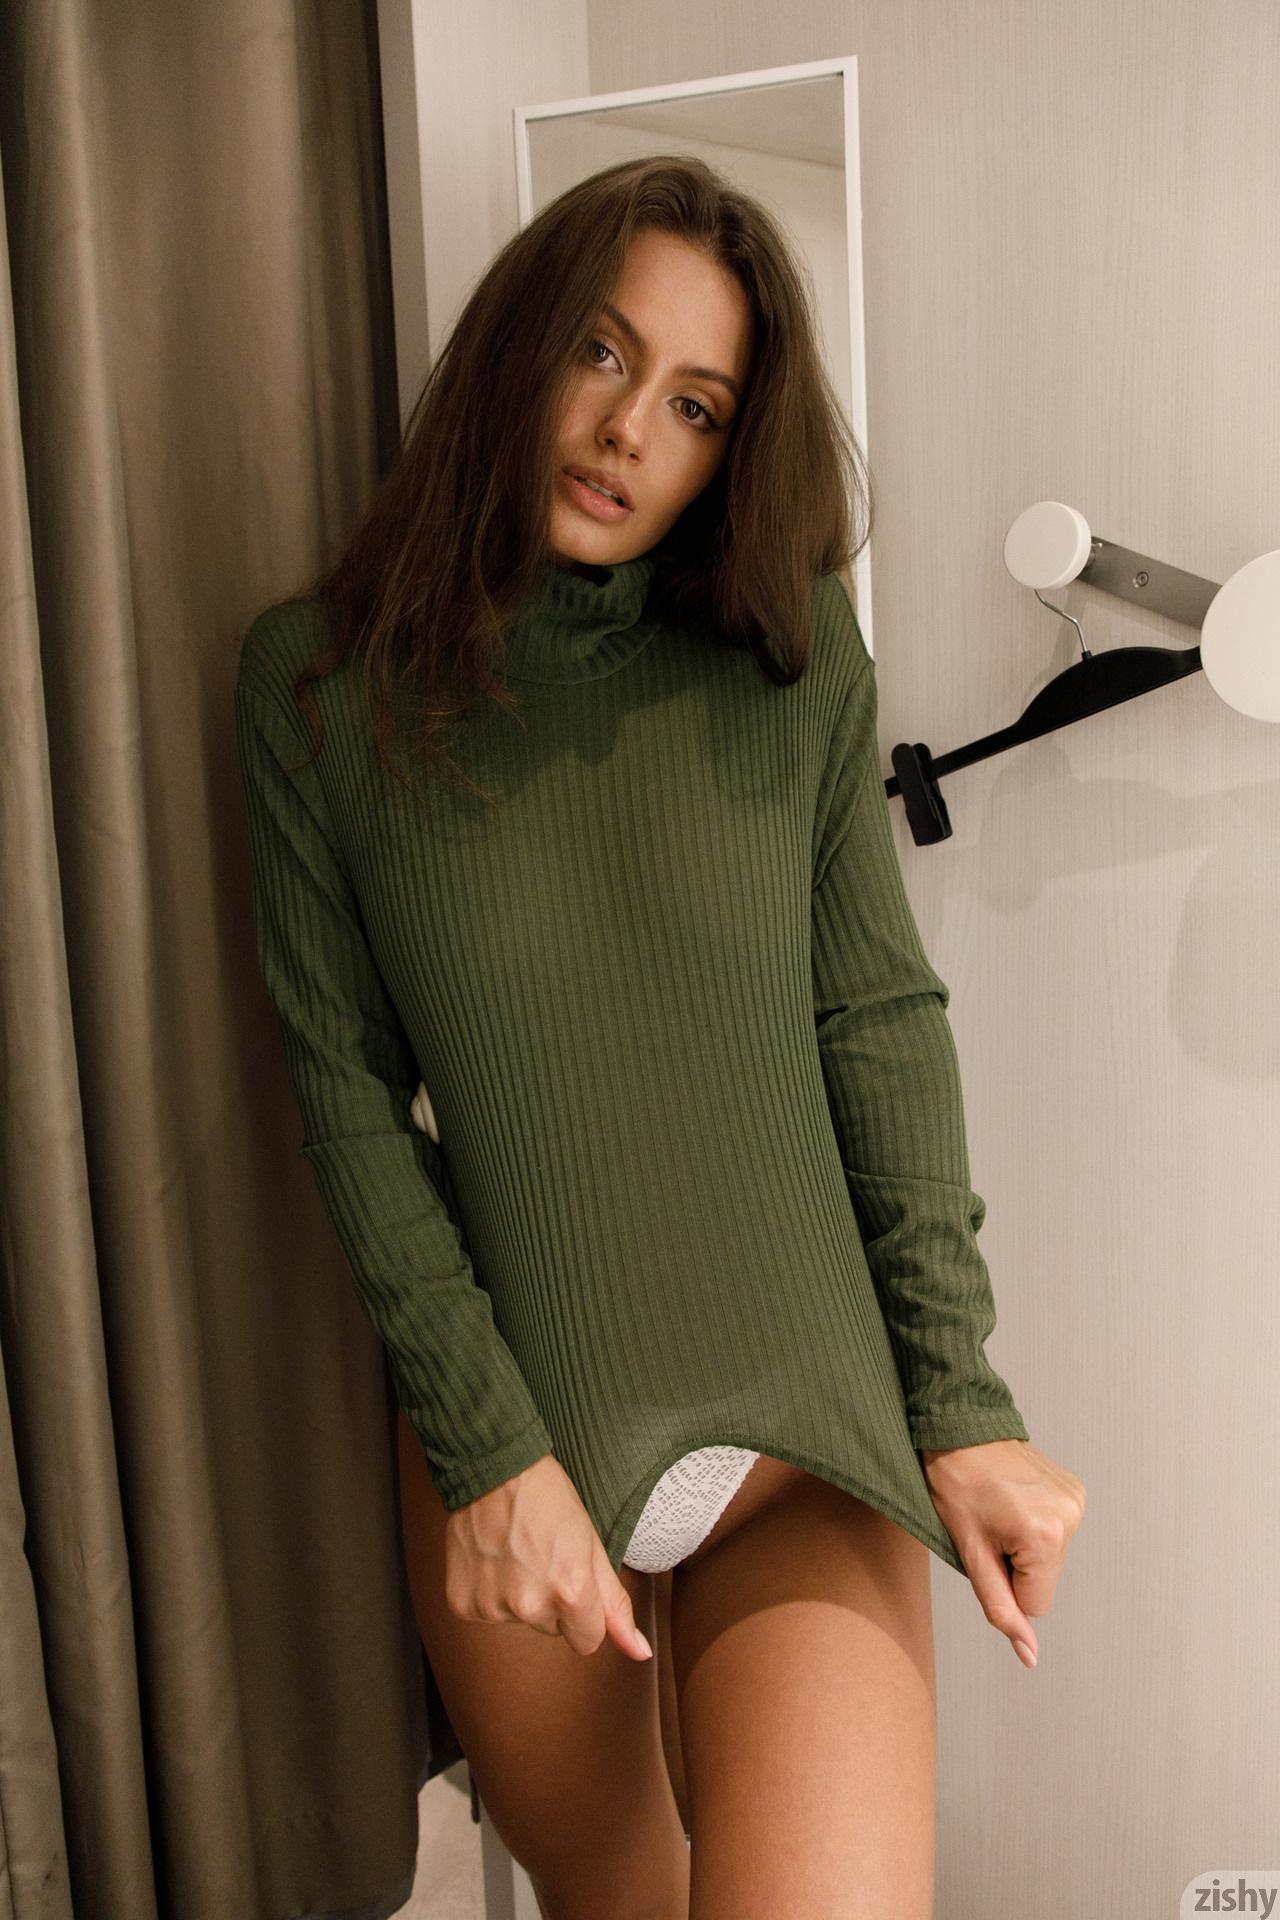 Shyla Volbeck Shopping With The Devil Zishy (36)